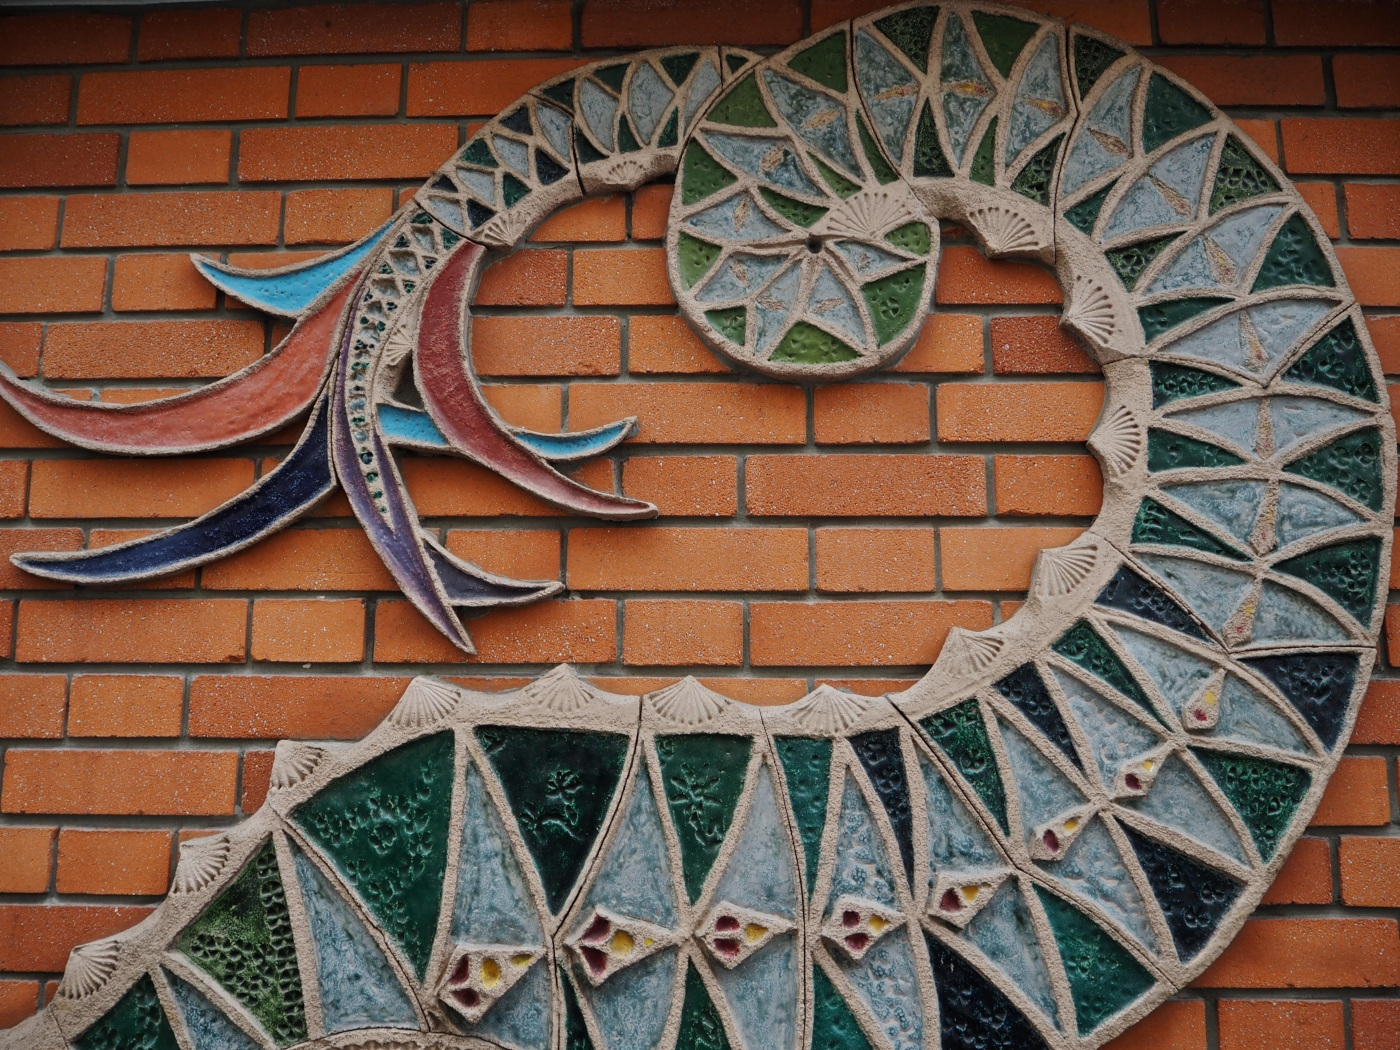 Paris street art ceramic dragon